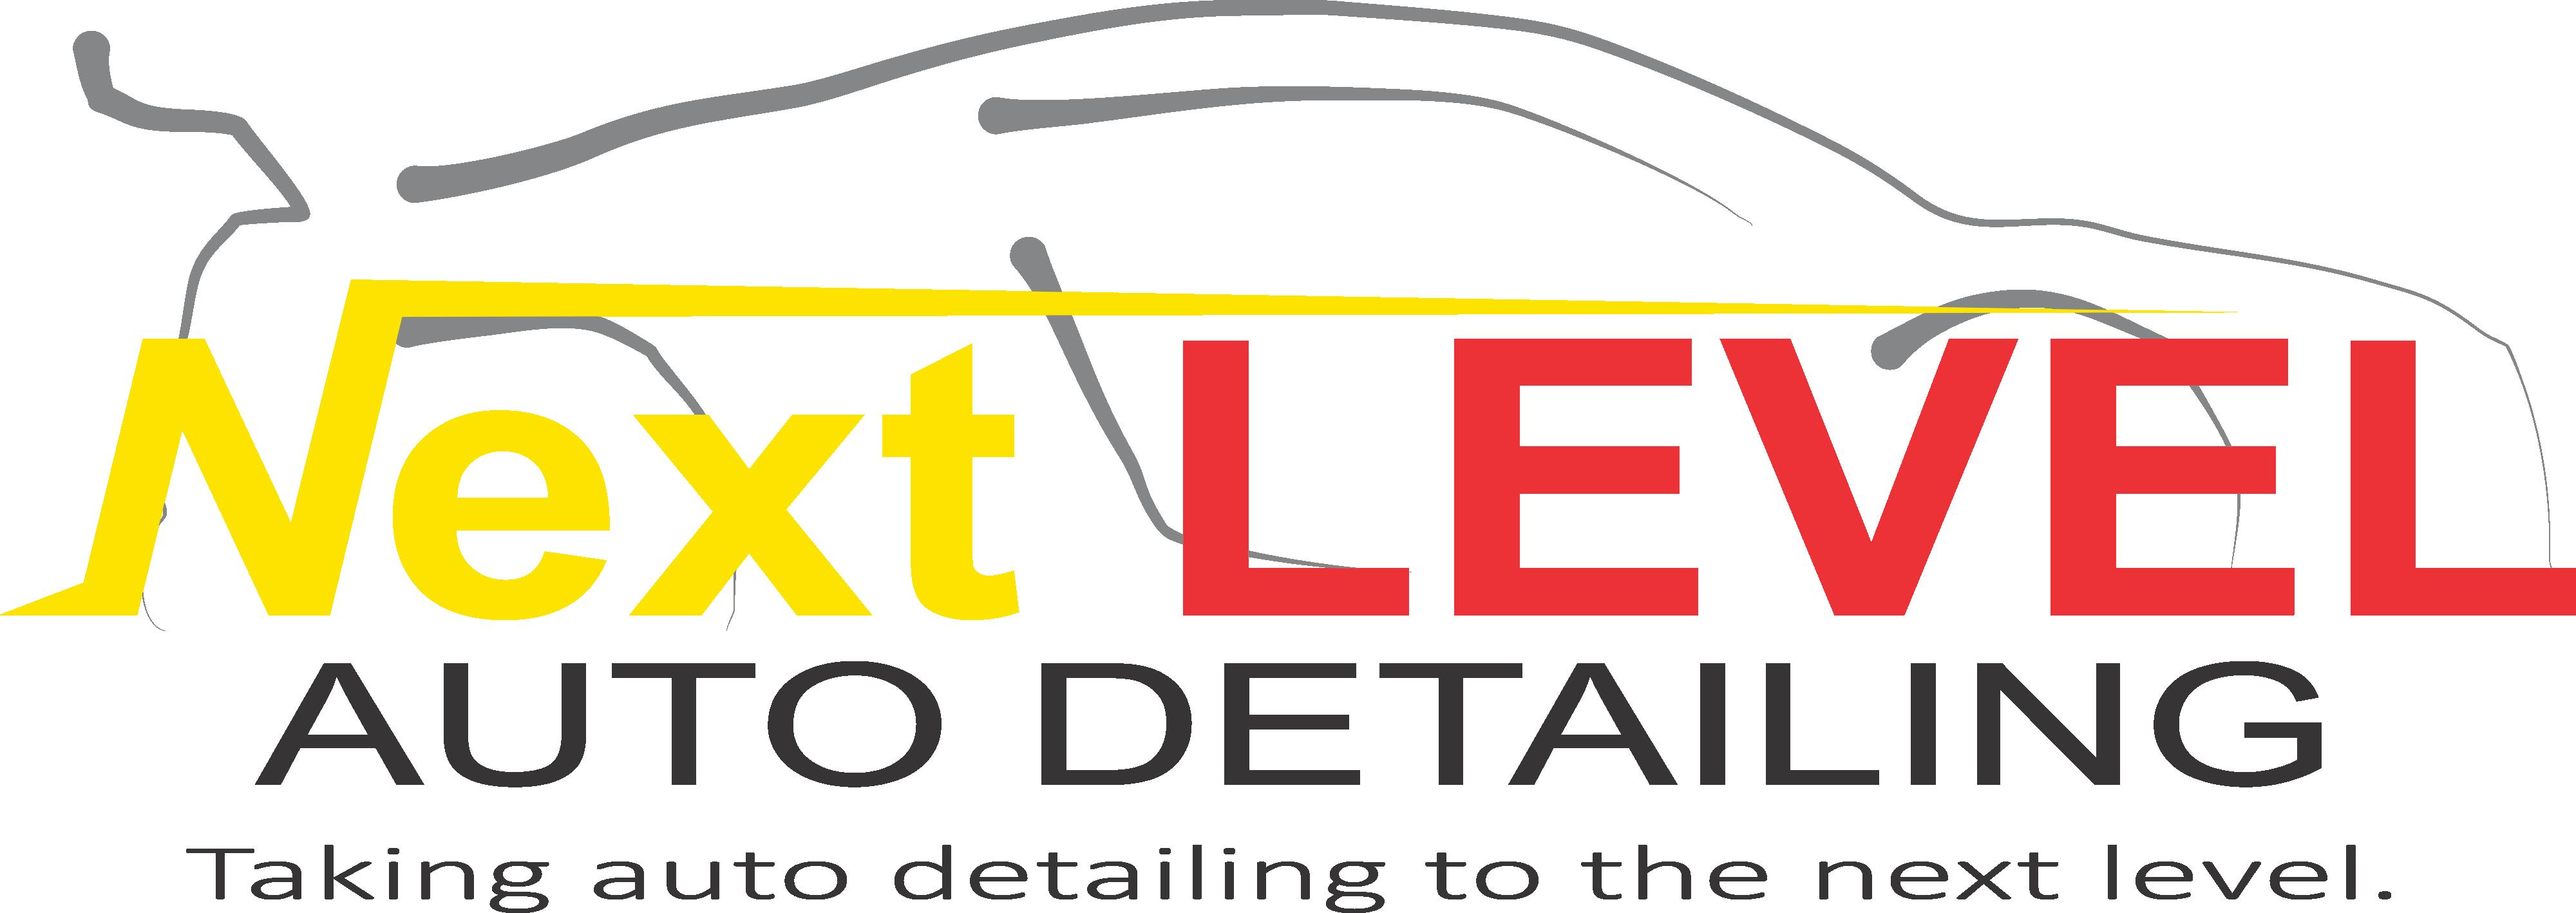 Next Level Auto Detailing